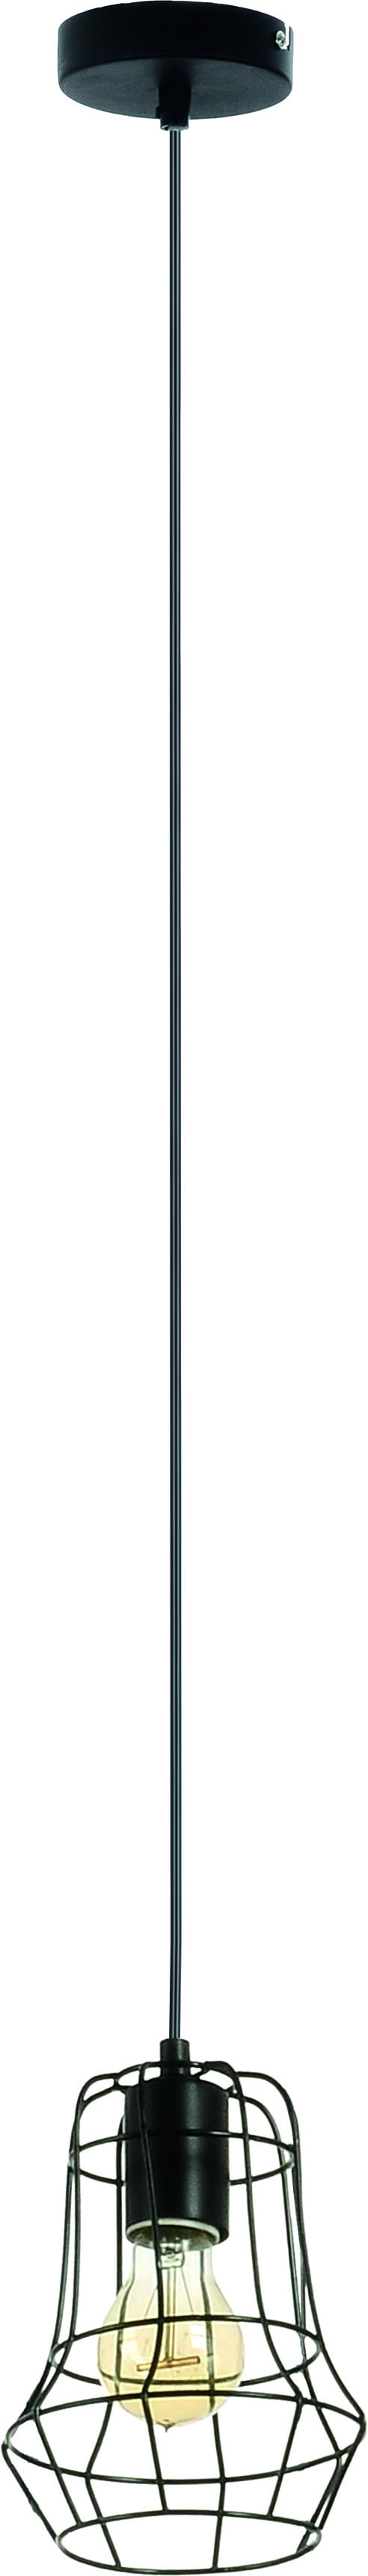 Hanging lamp Loft Black 60W